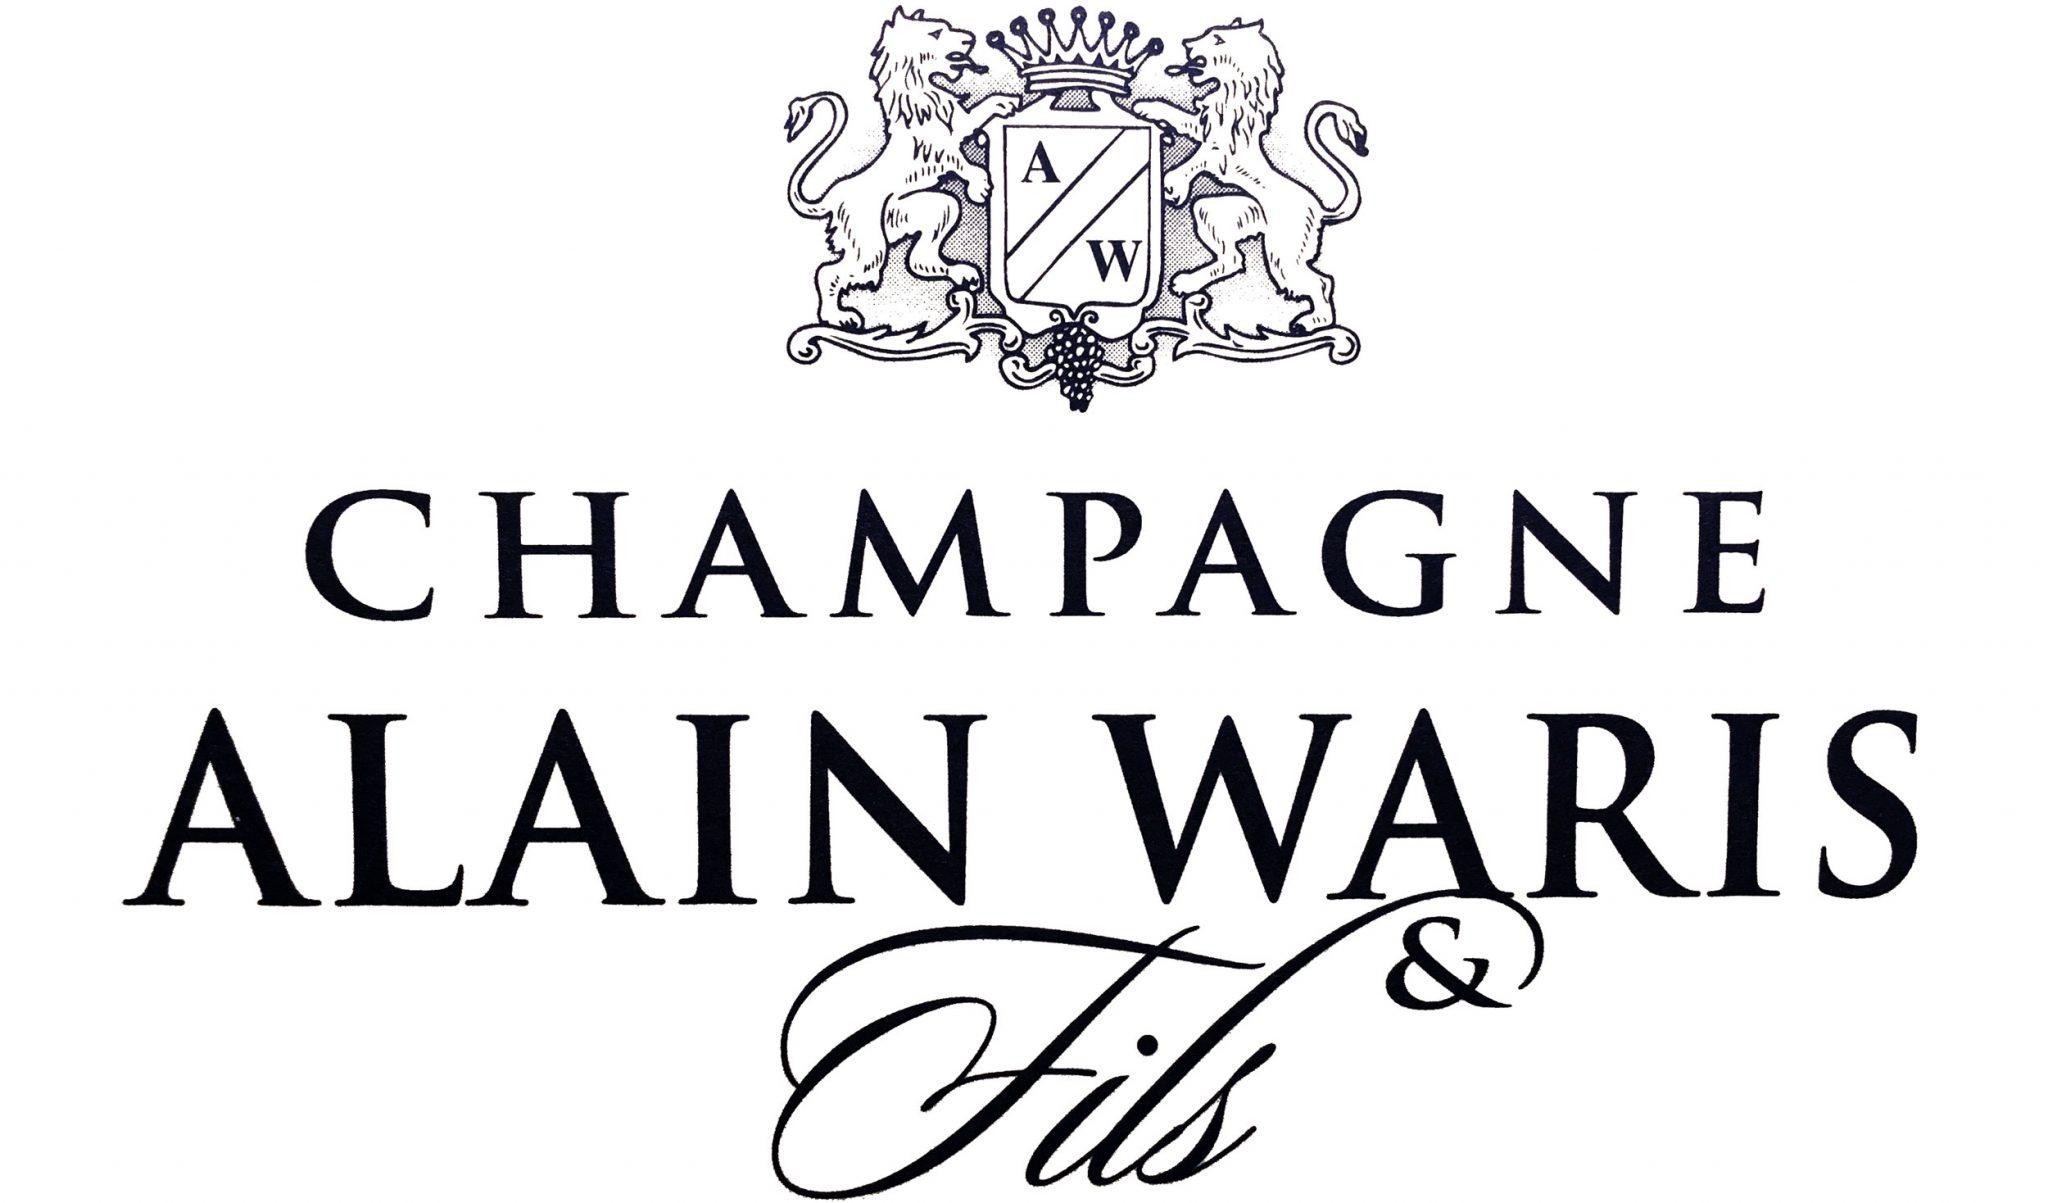 Champagne Alain Waris